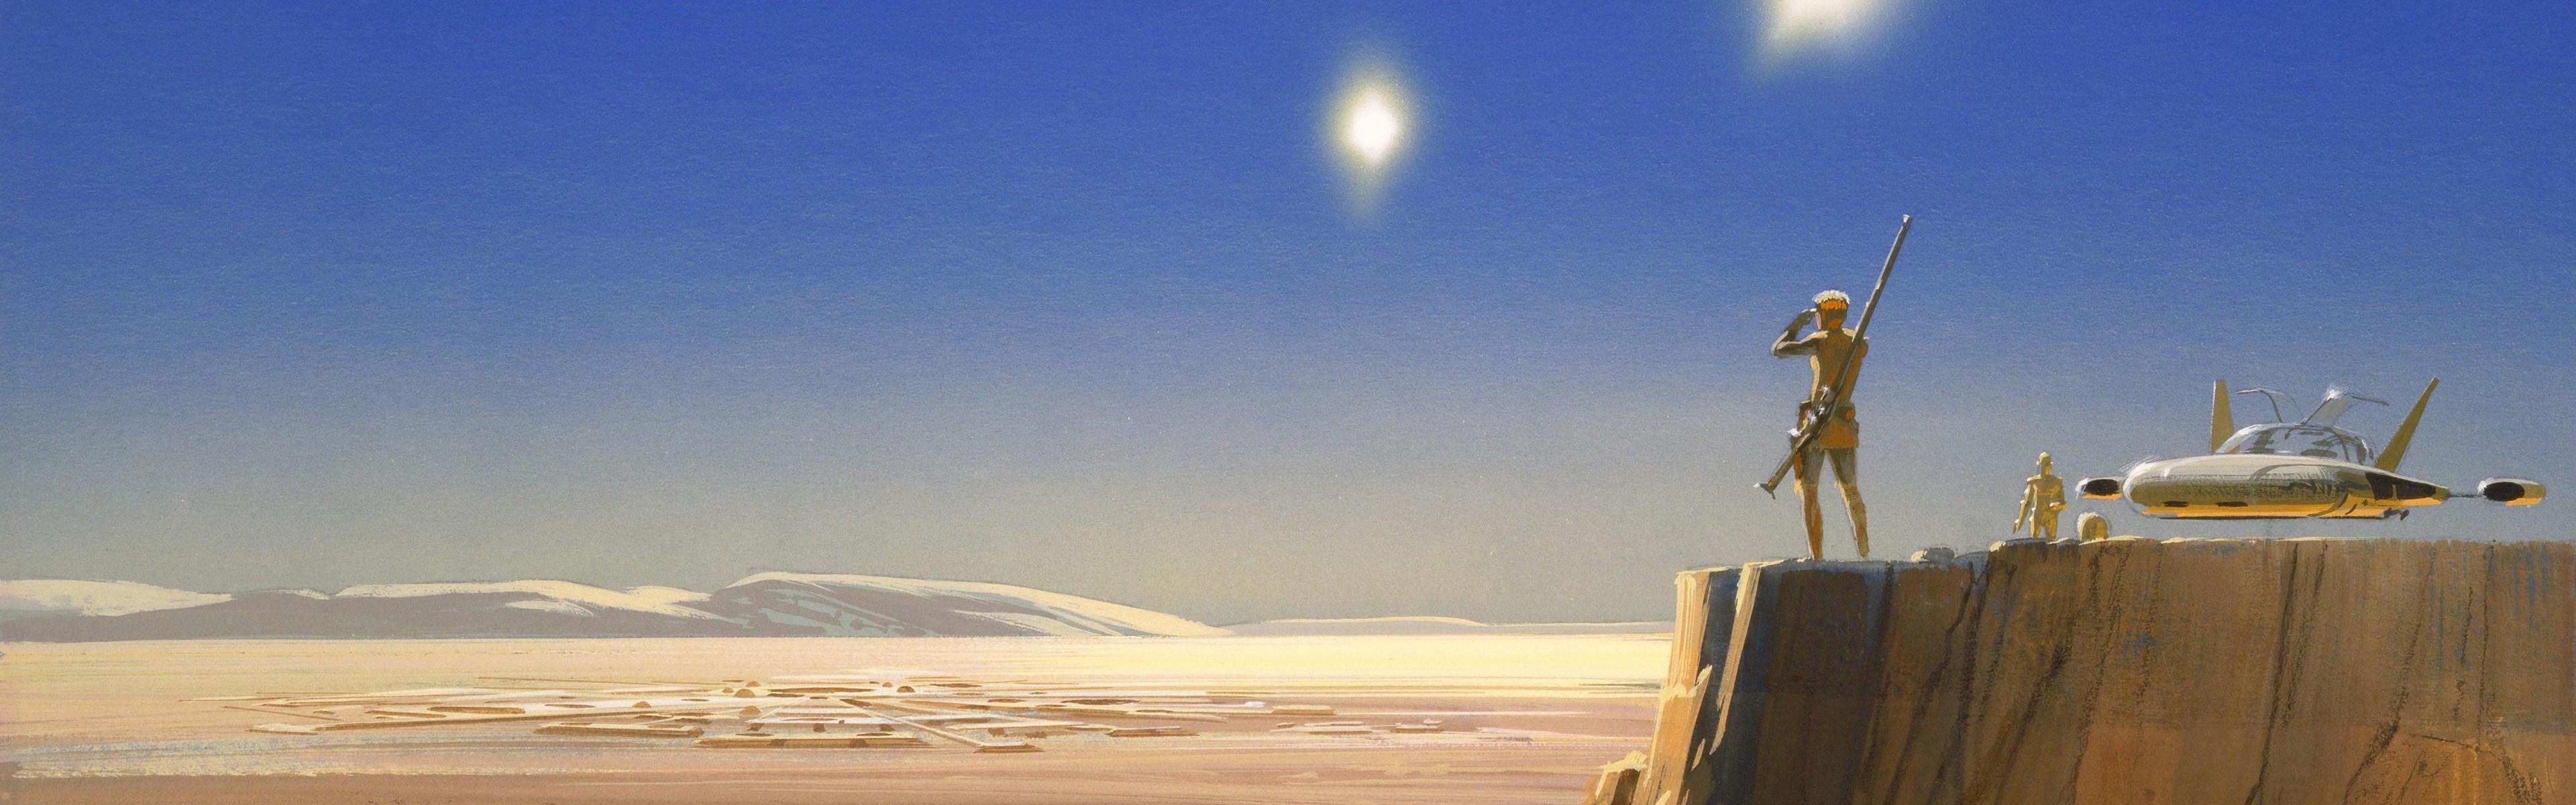 Star Wars, Tatooine, Desert, Artwork, Dual Monitors, Multiple Display, Concept  Art Wallpapers HD / Desktop and Mobile Backgrounds